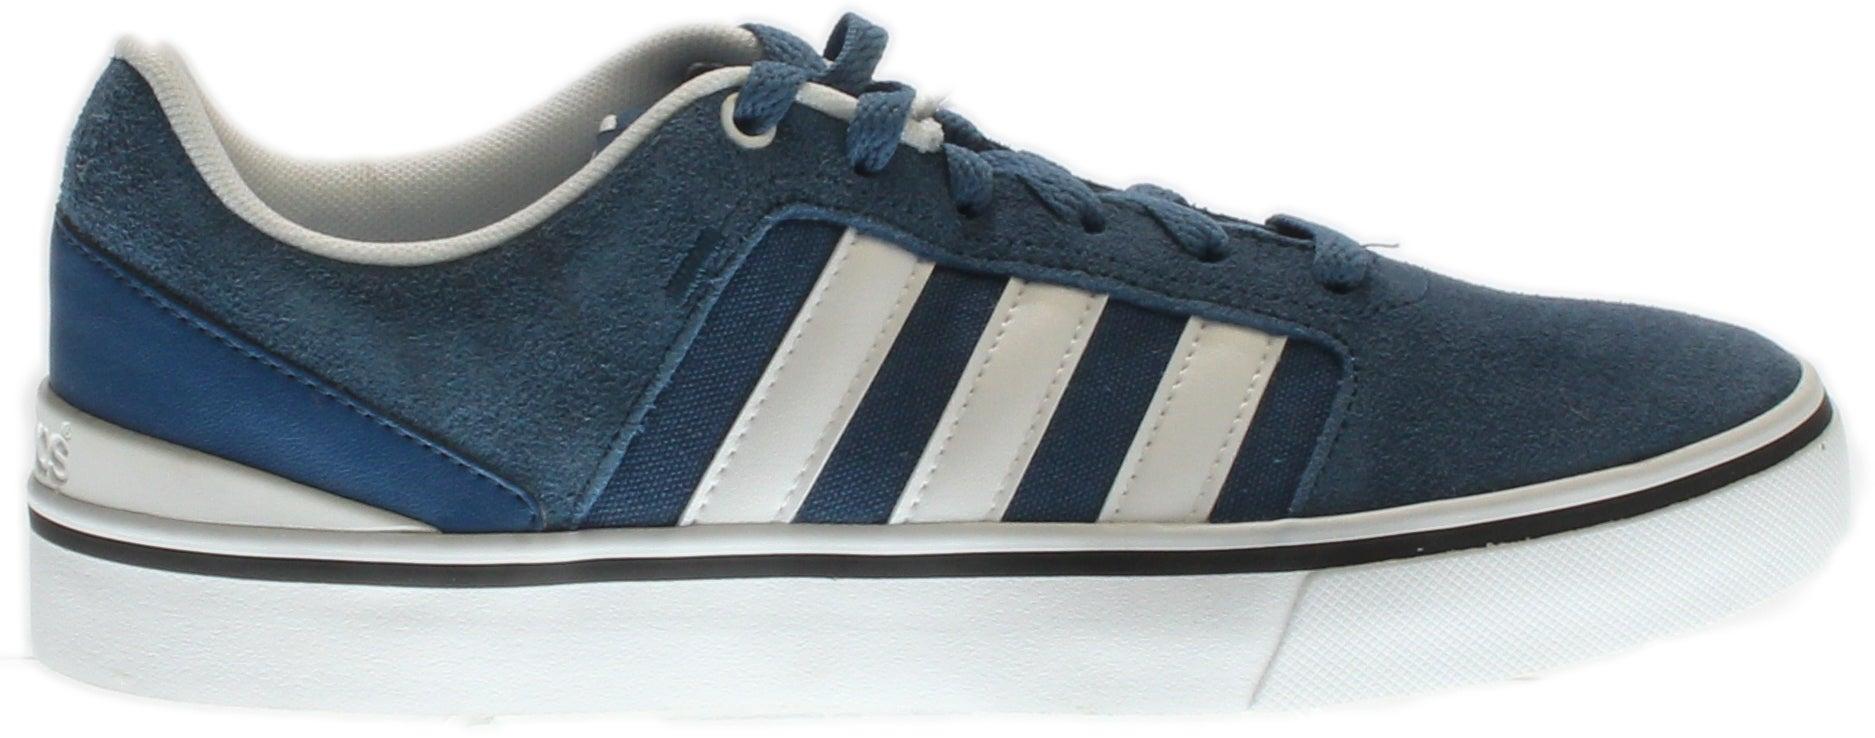 adidas Hawthorn St Blue - Mens  - Size 6.5